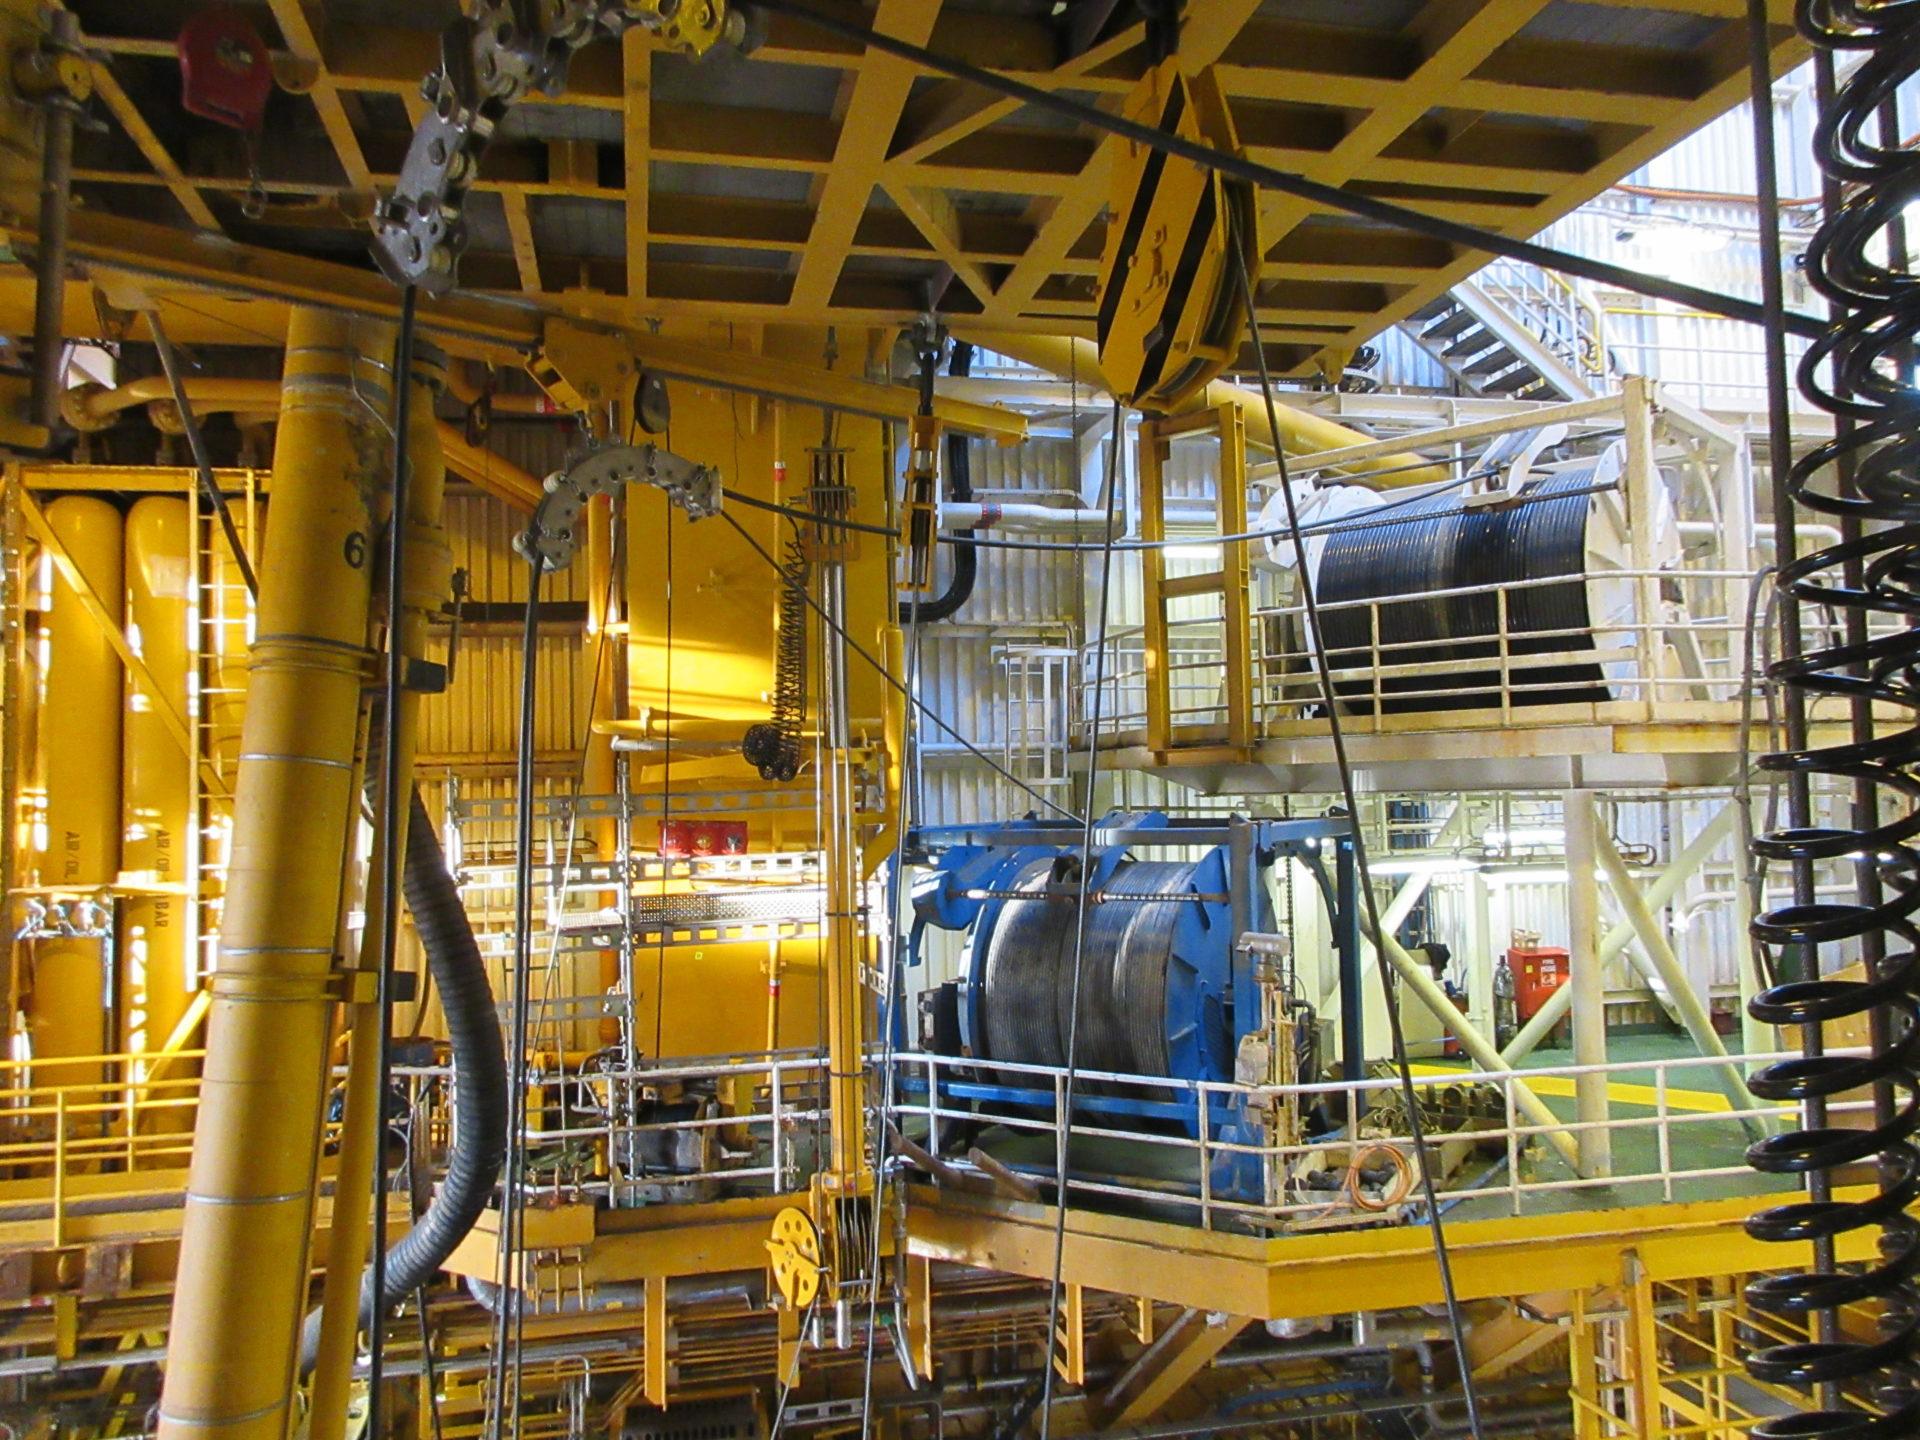 MUX Compensation System for Deepsea Stavanger